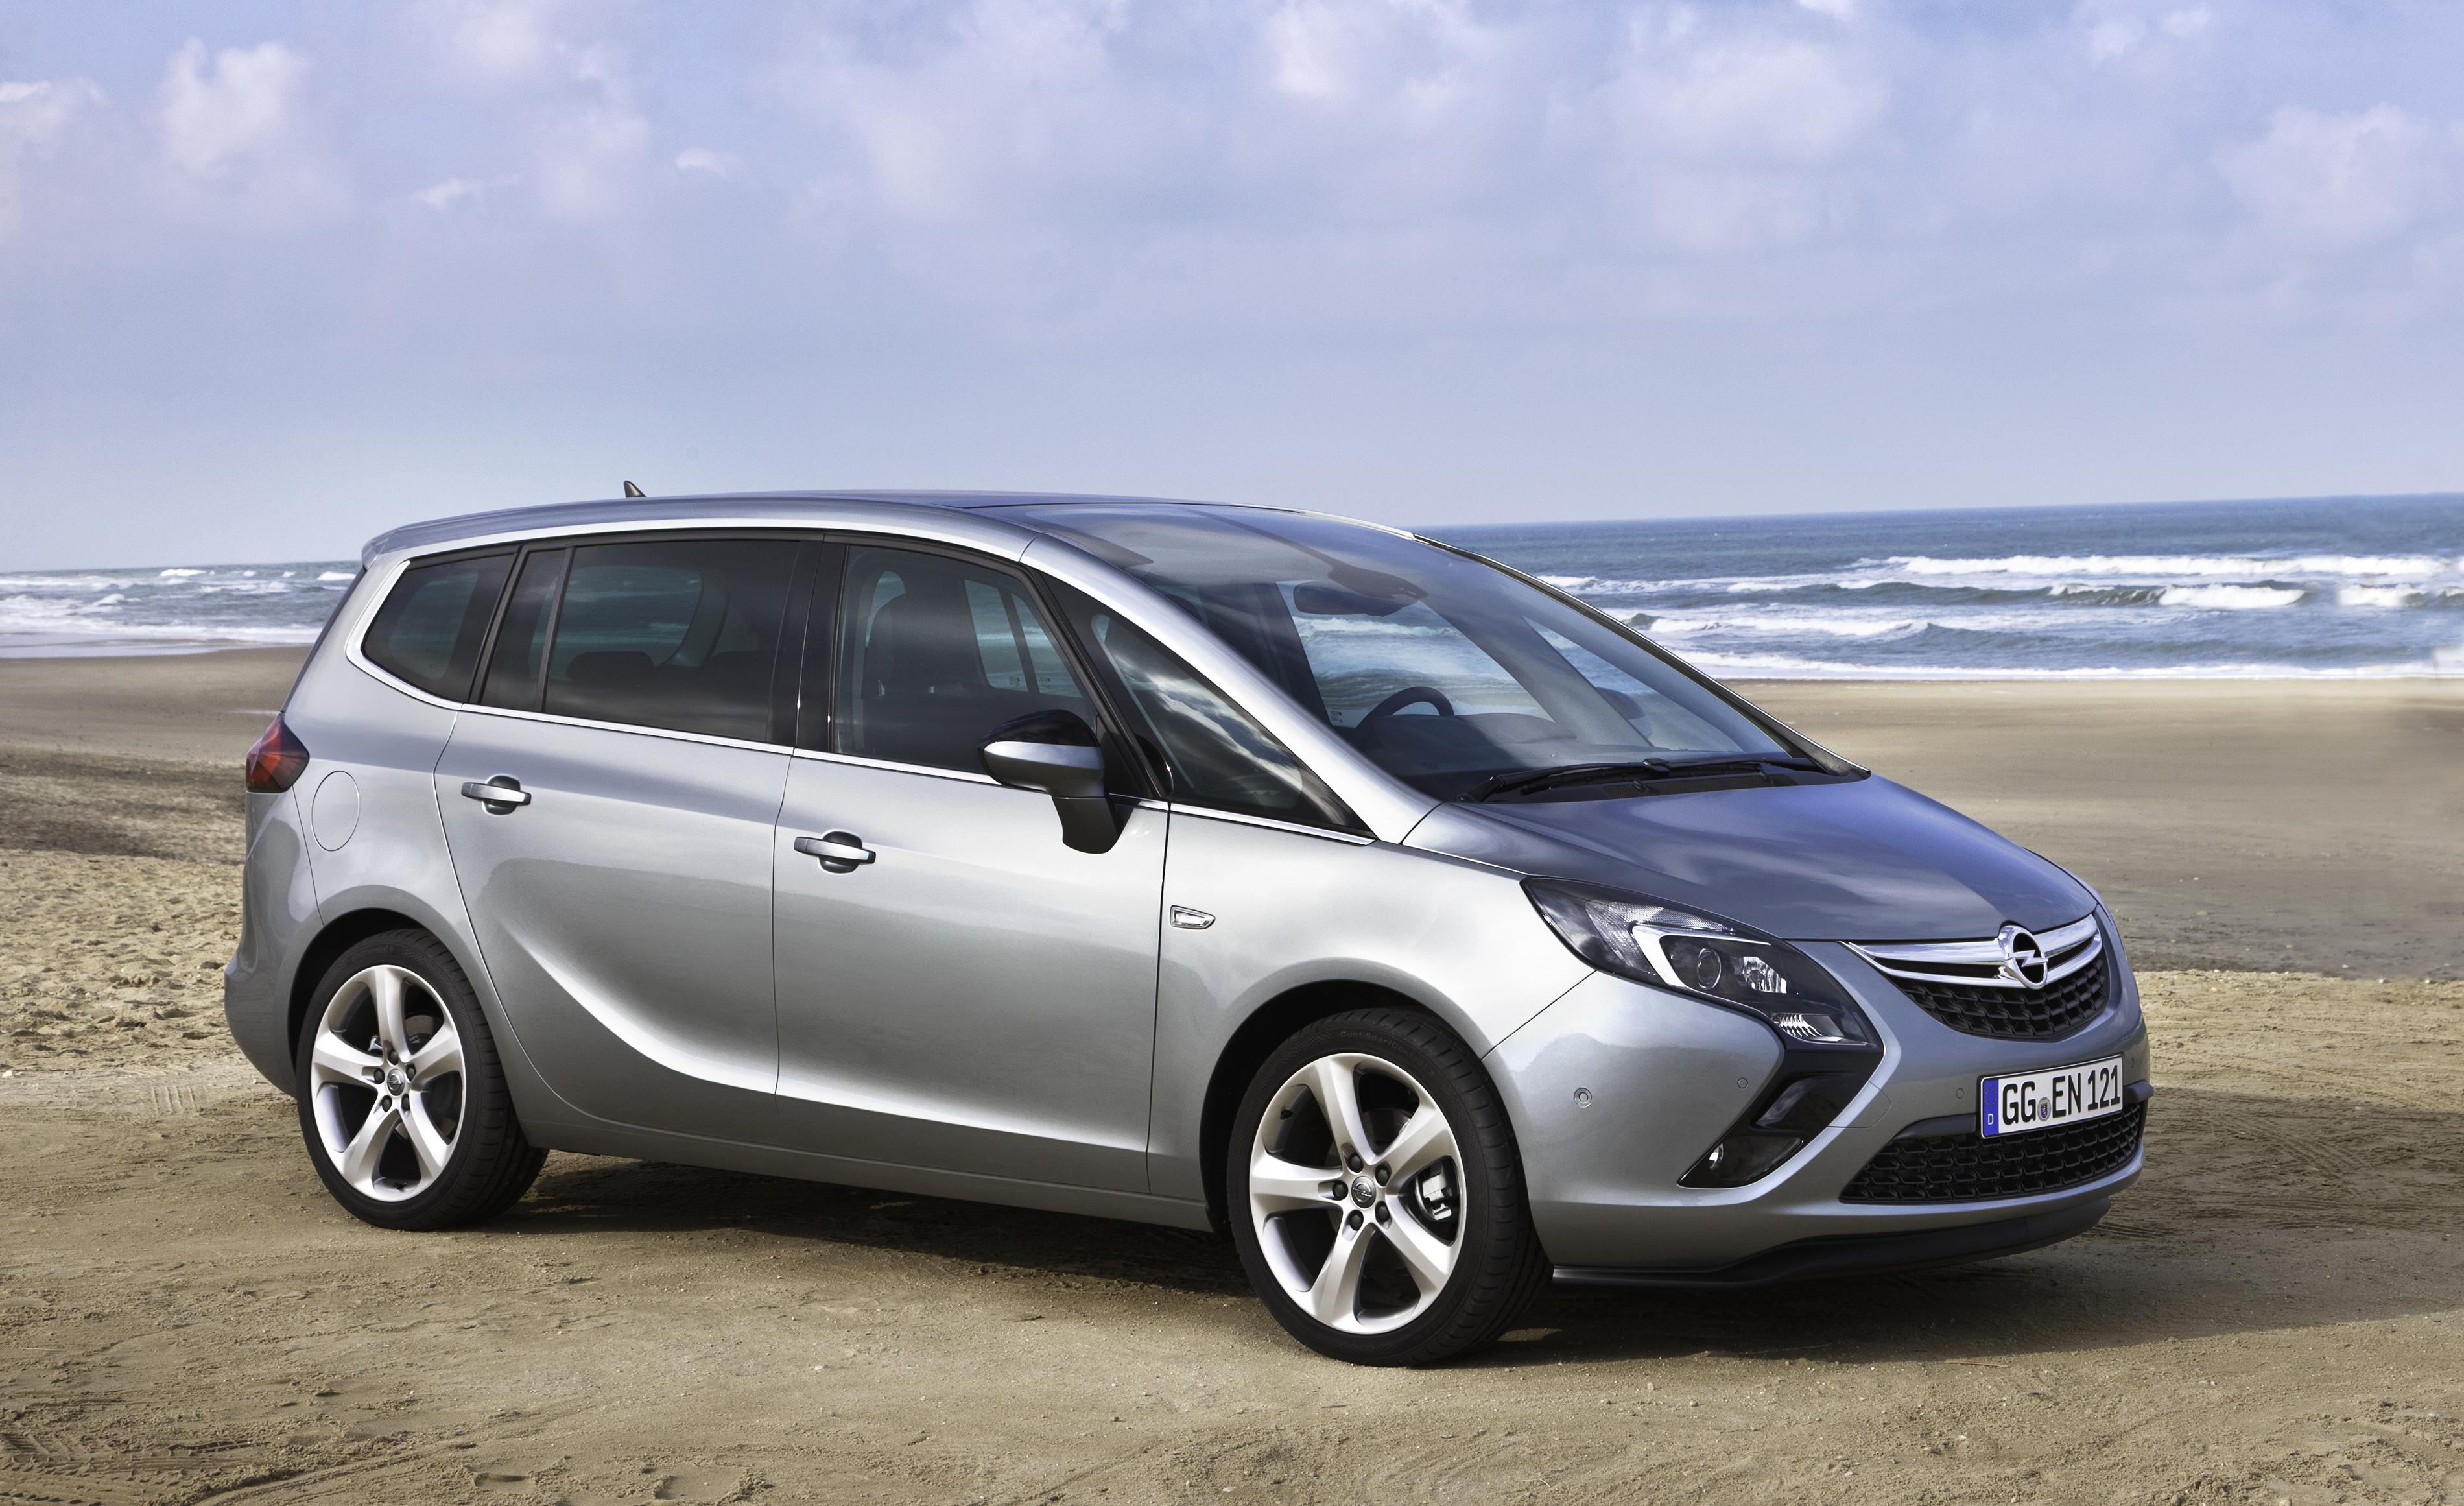 Opel Zafira Tourer 1.6 CDTI: silenziosissima